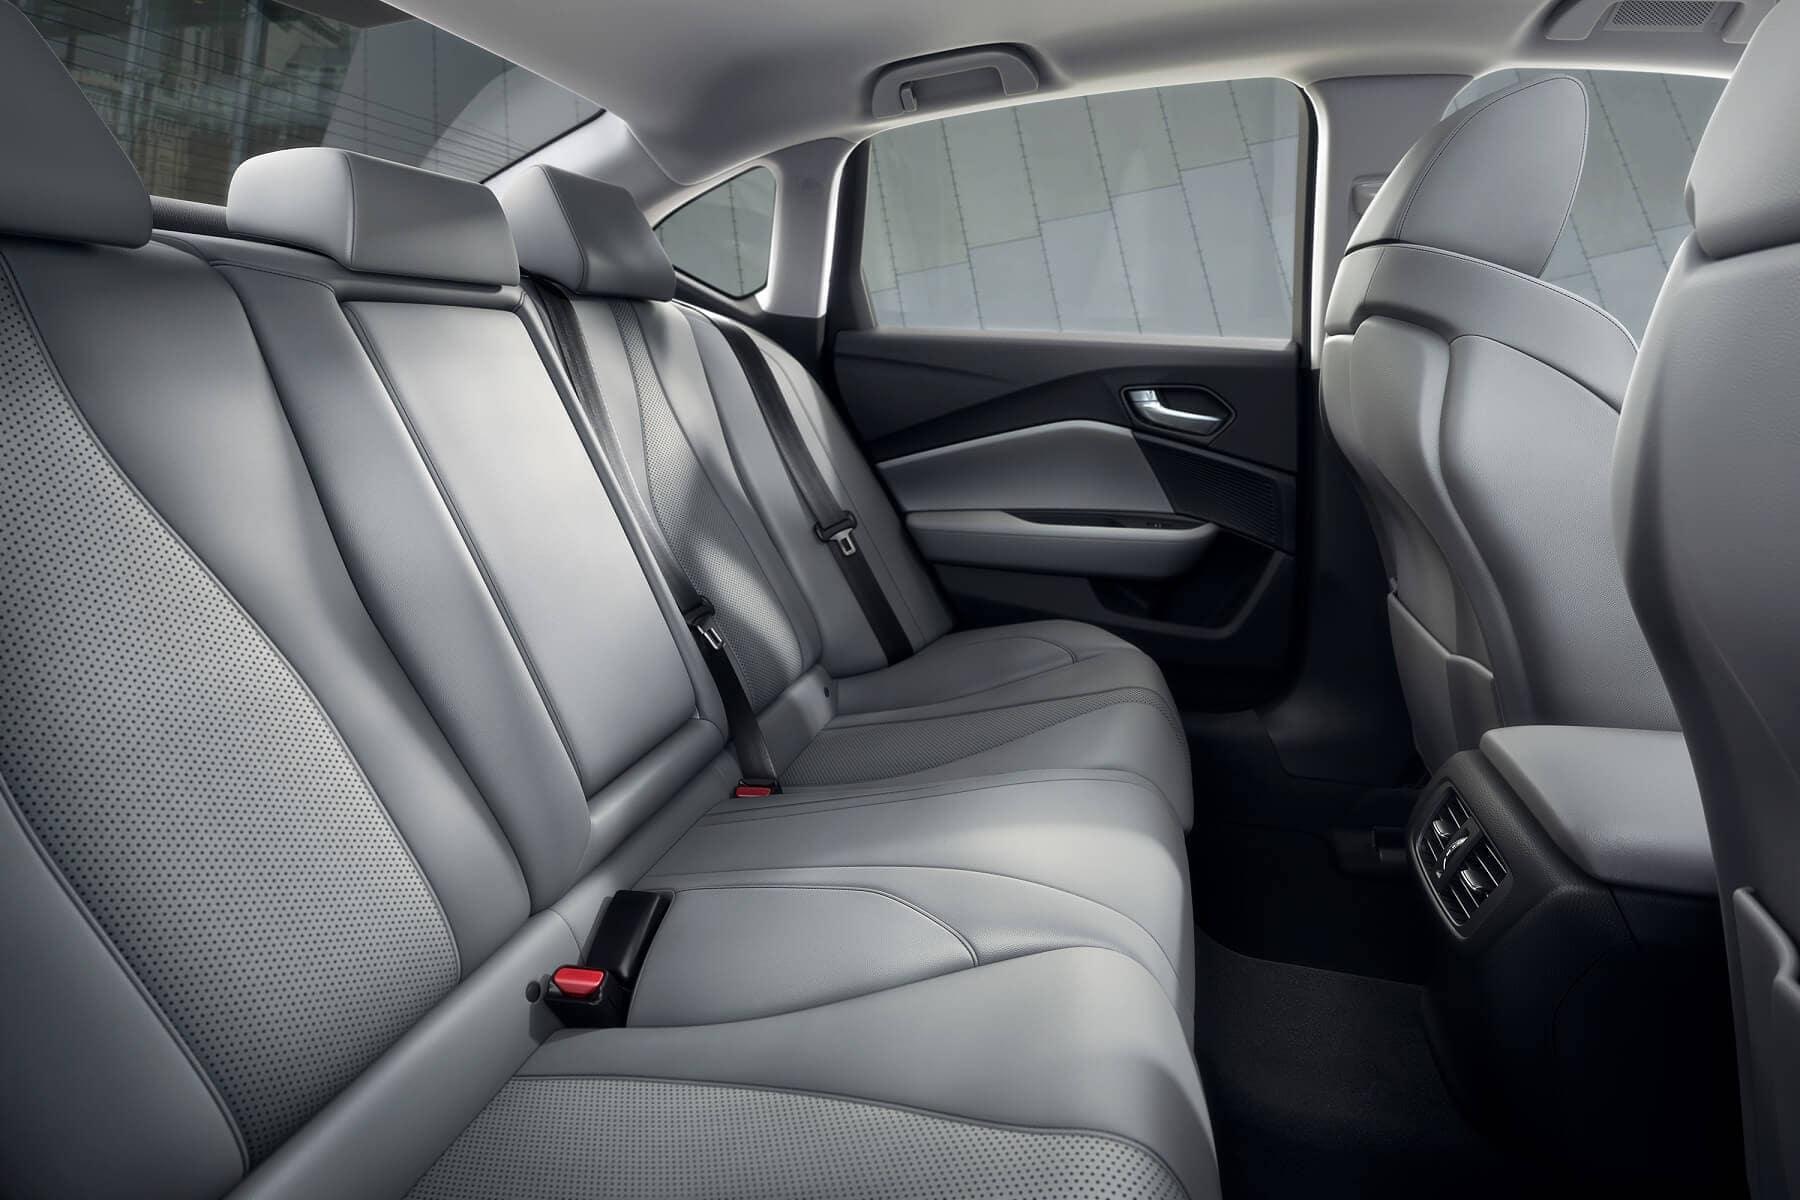 2021 Acura TLX Backseats